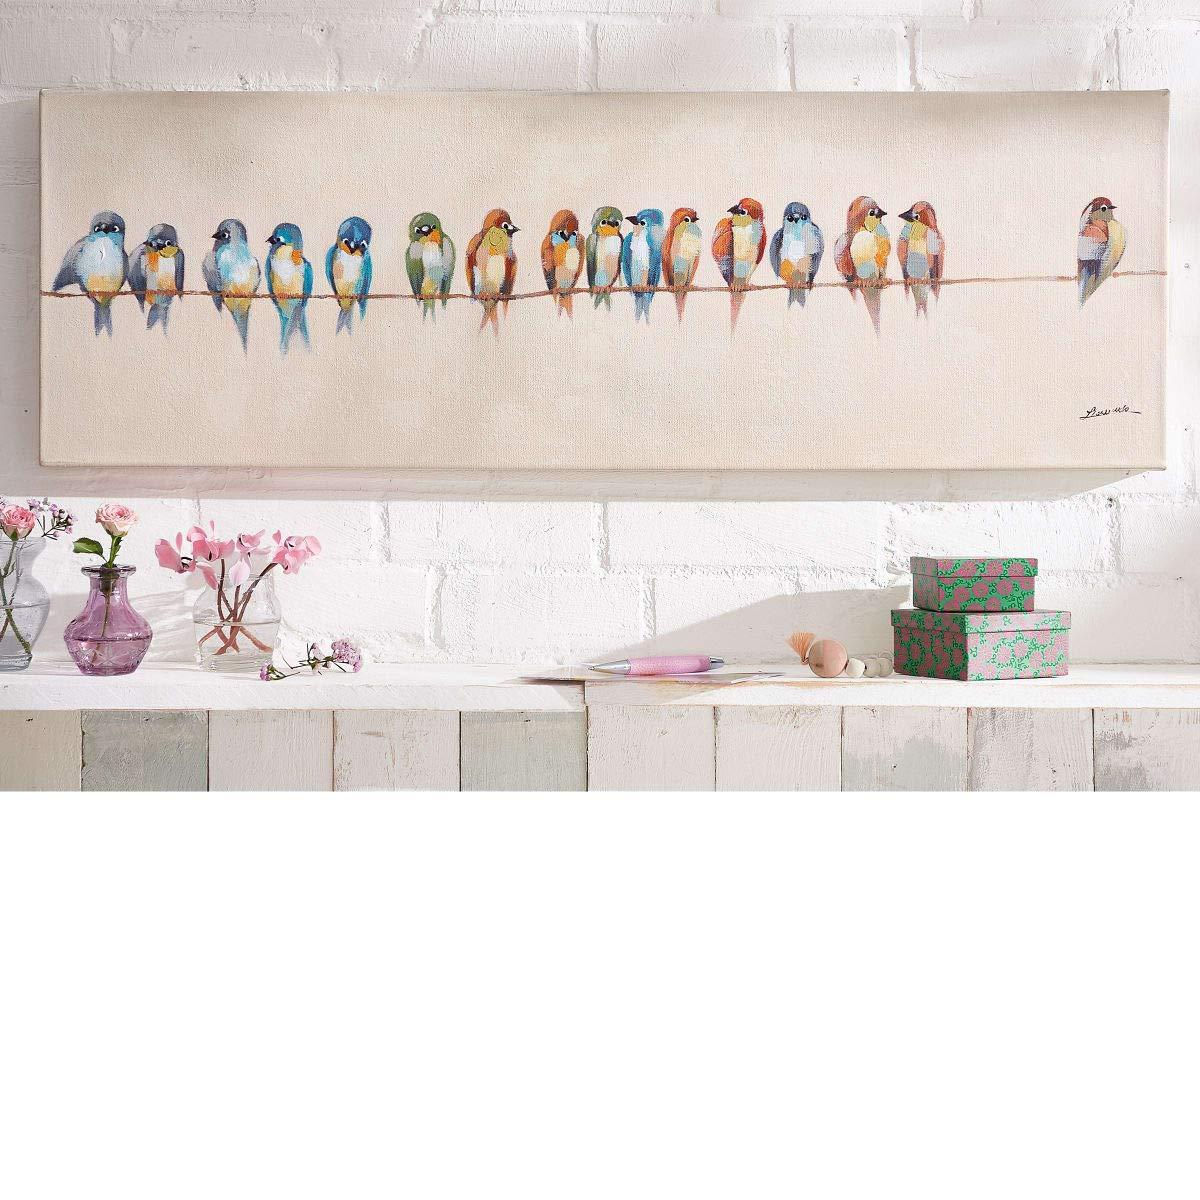 PuROTay Bild Birdies - Leinwandbild - Vögel - Handgemalt - ca. 90 x 30 cm